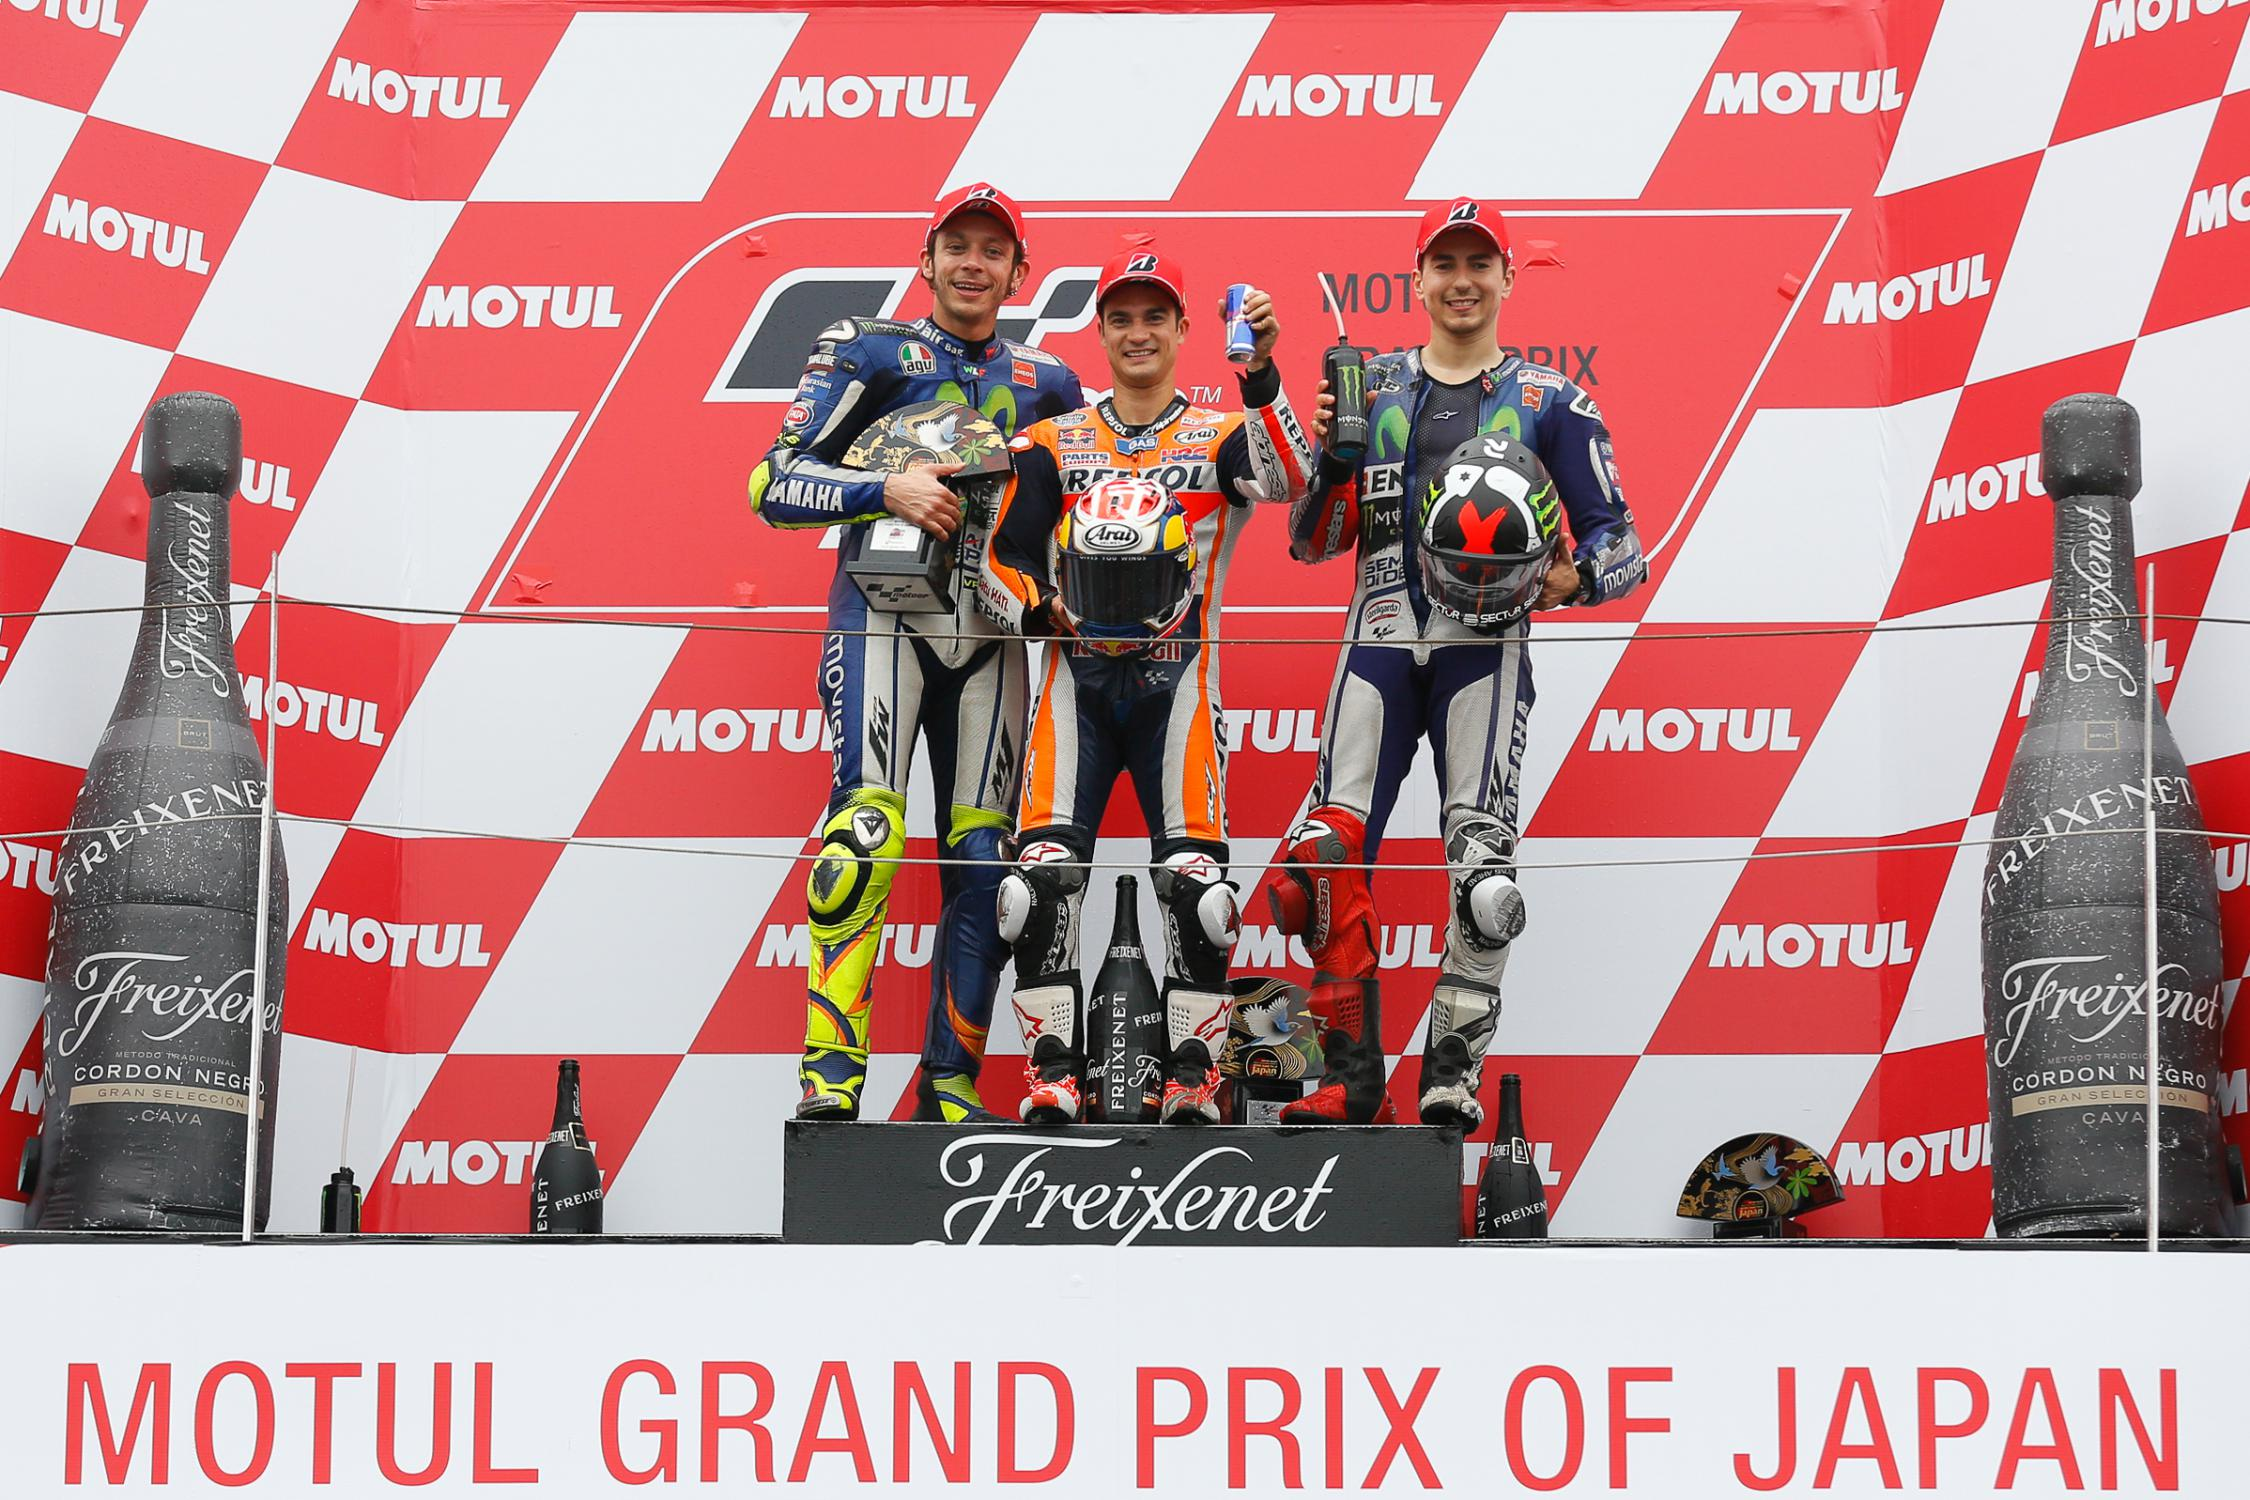 Le podium du Motegi 2015